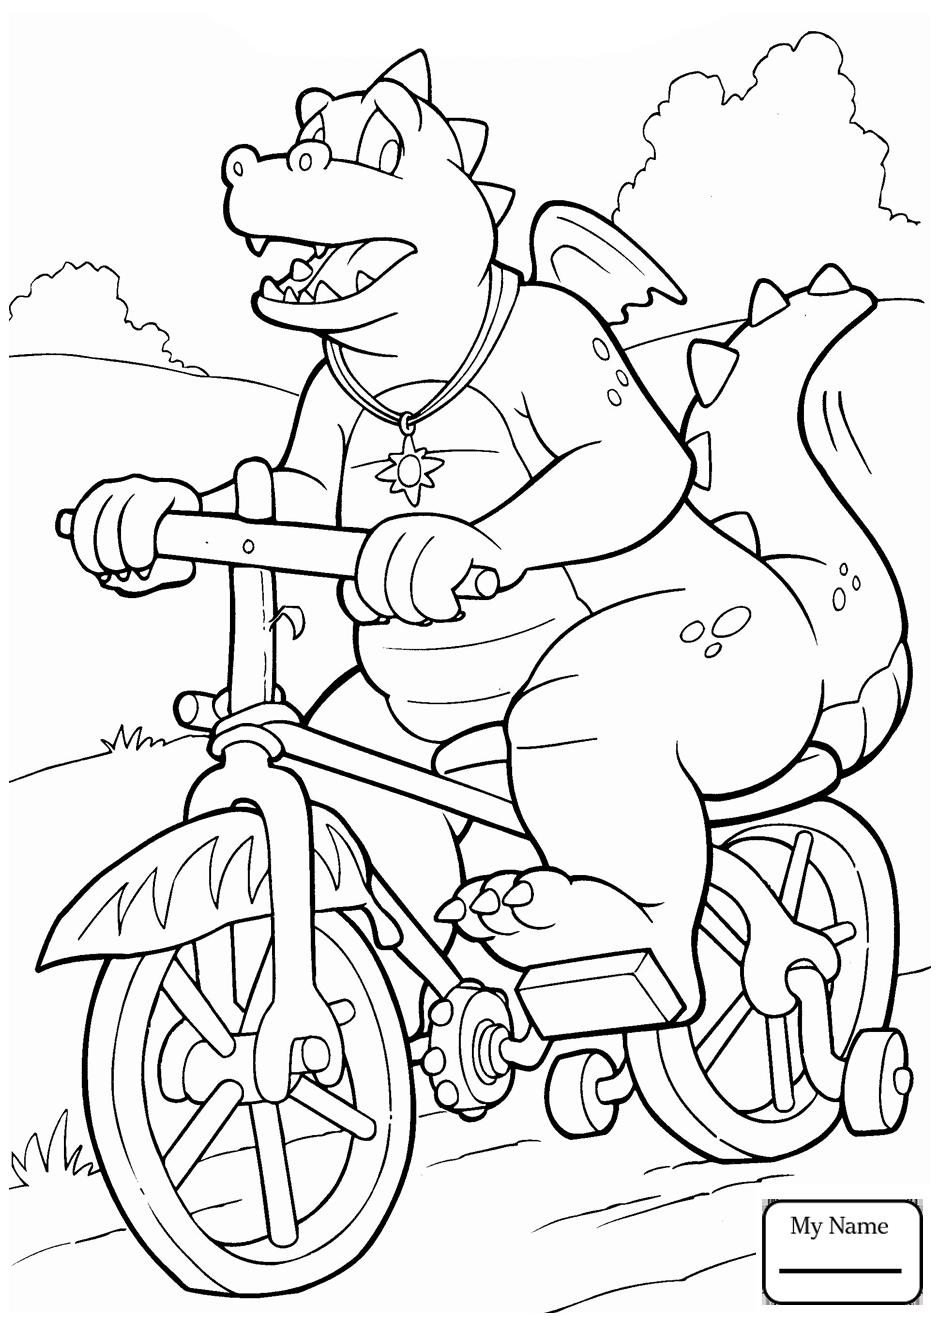 Mr Crayon Dragon Tales Cartoons Dragon Tales Coloring Pages